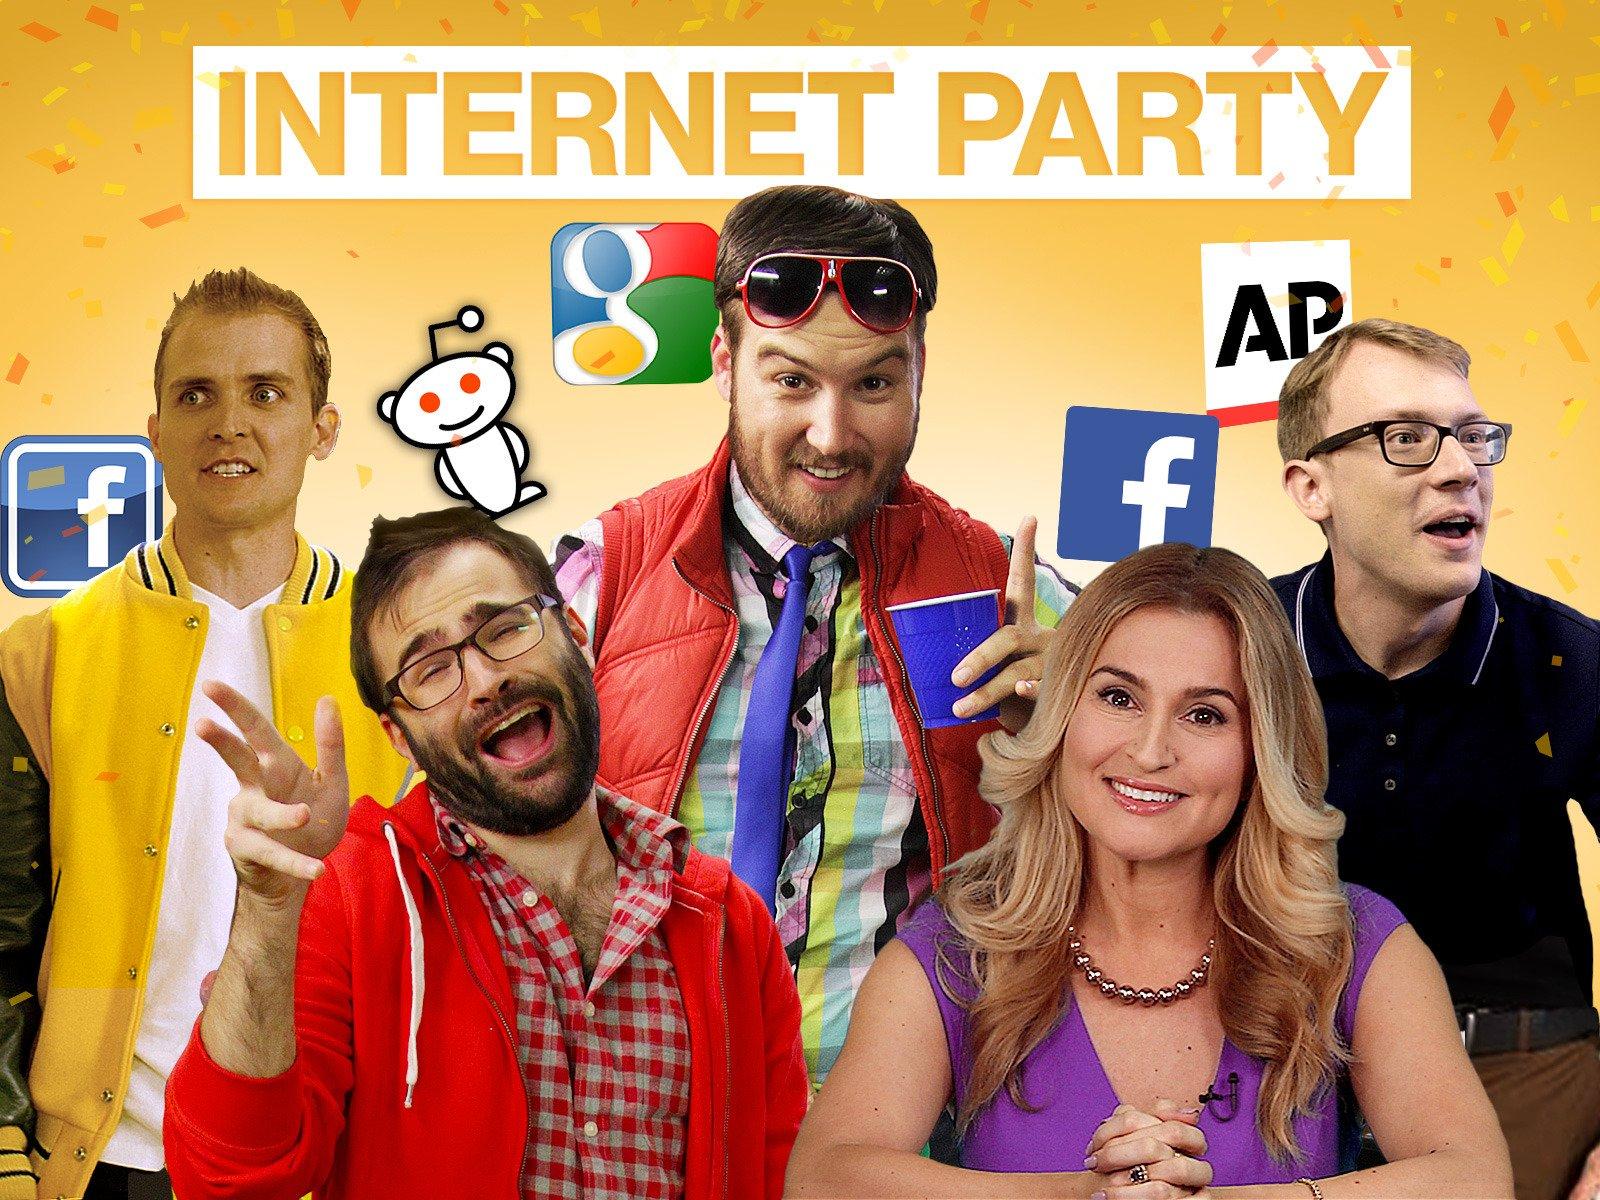 Internet Party - Season 1